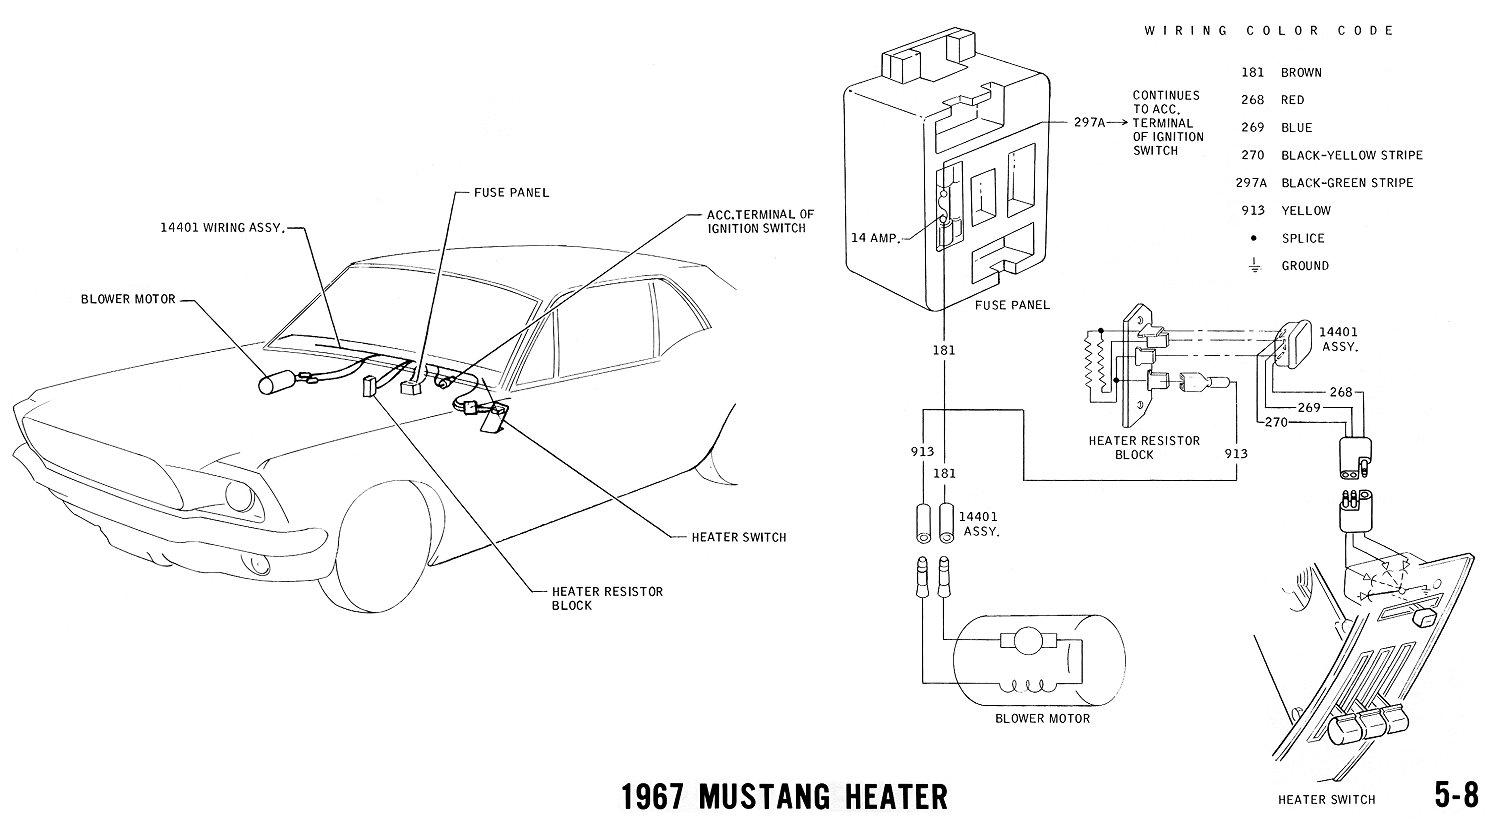 radio wire harness wiring harness wiring diagram wiring